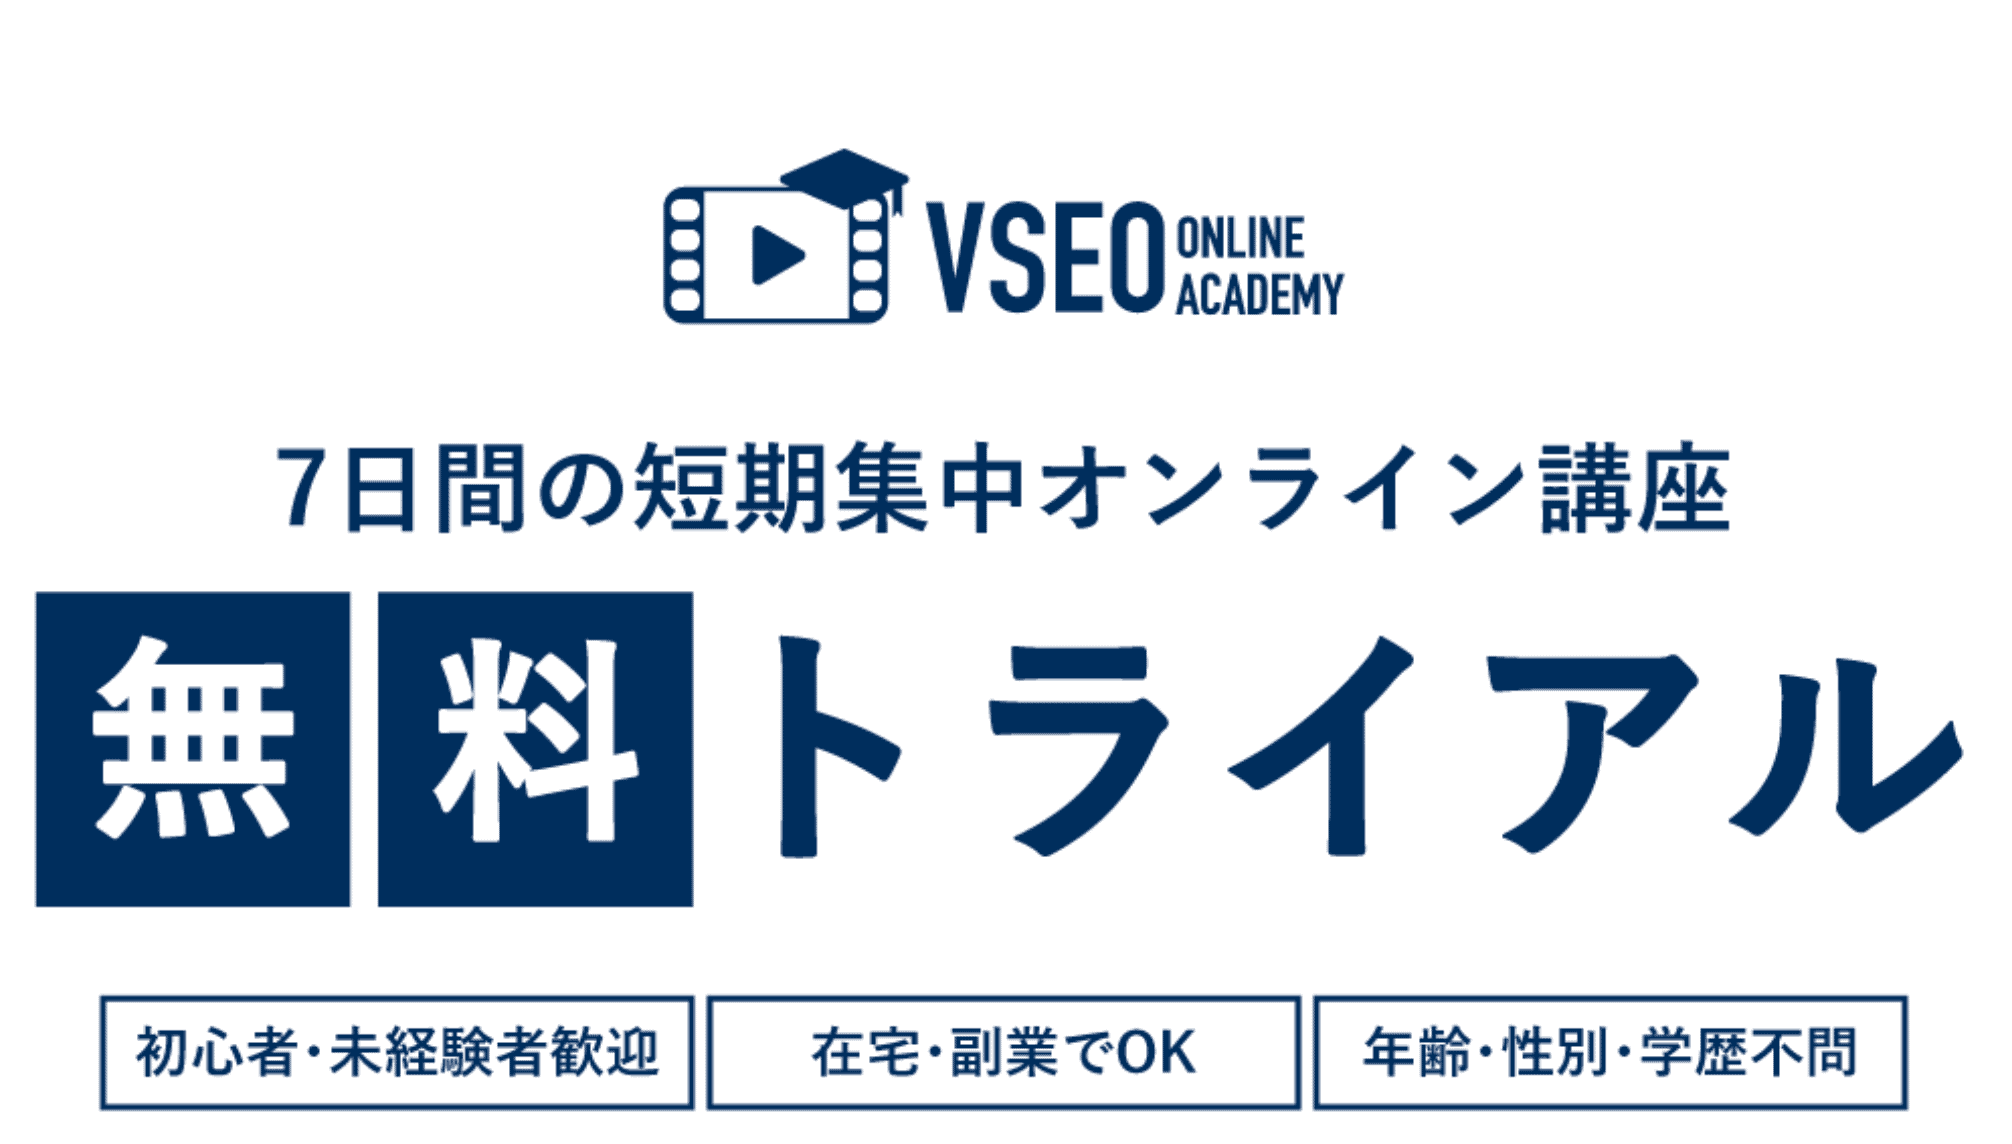 VSEOオンラインアカデミー無料講座